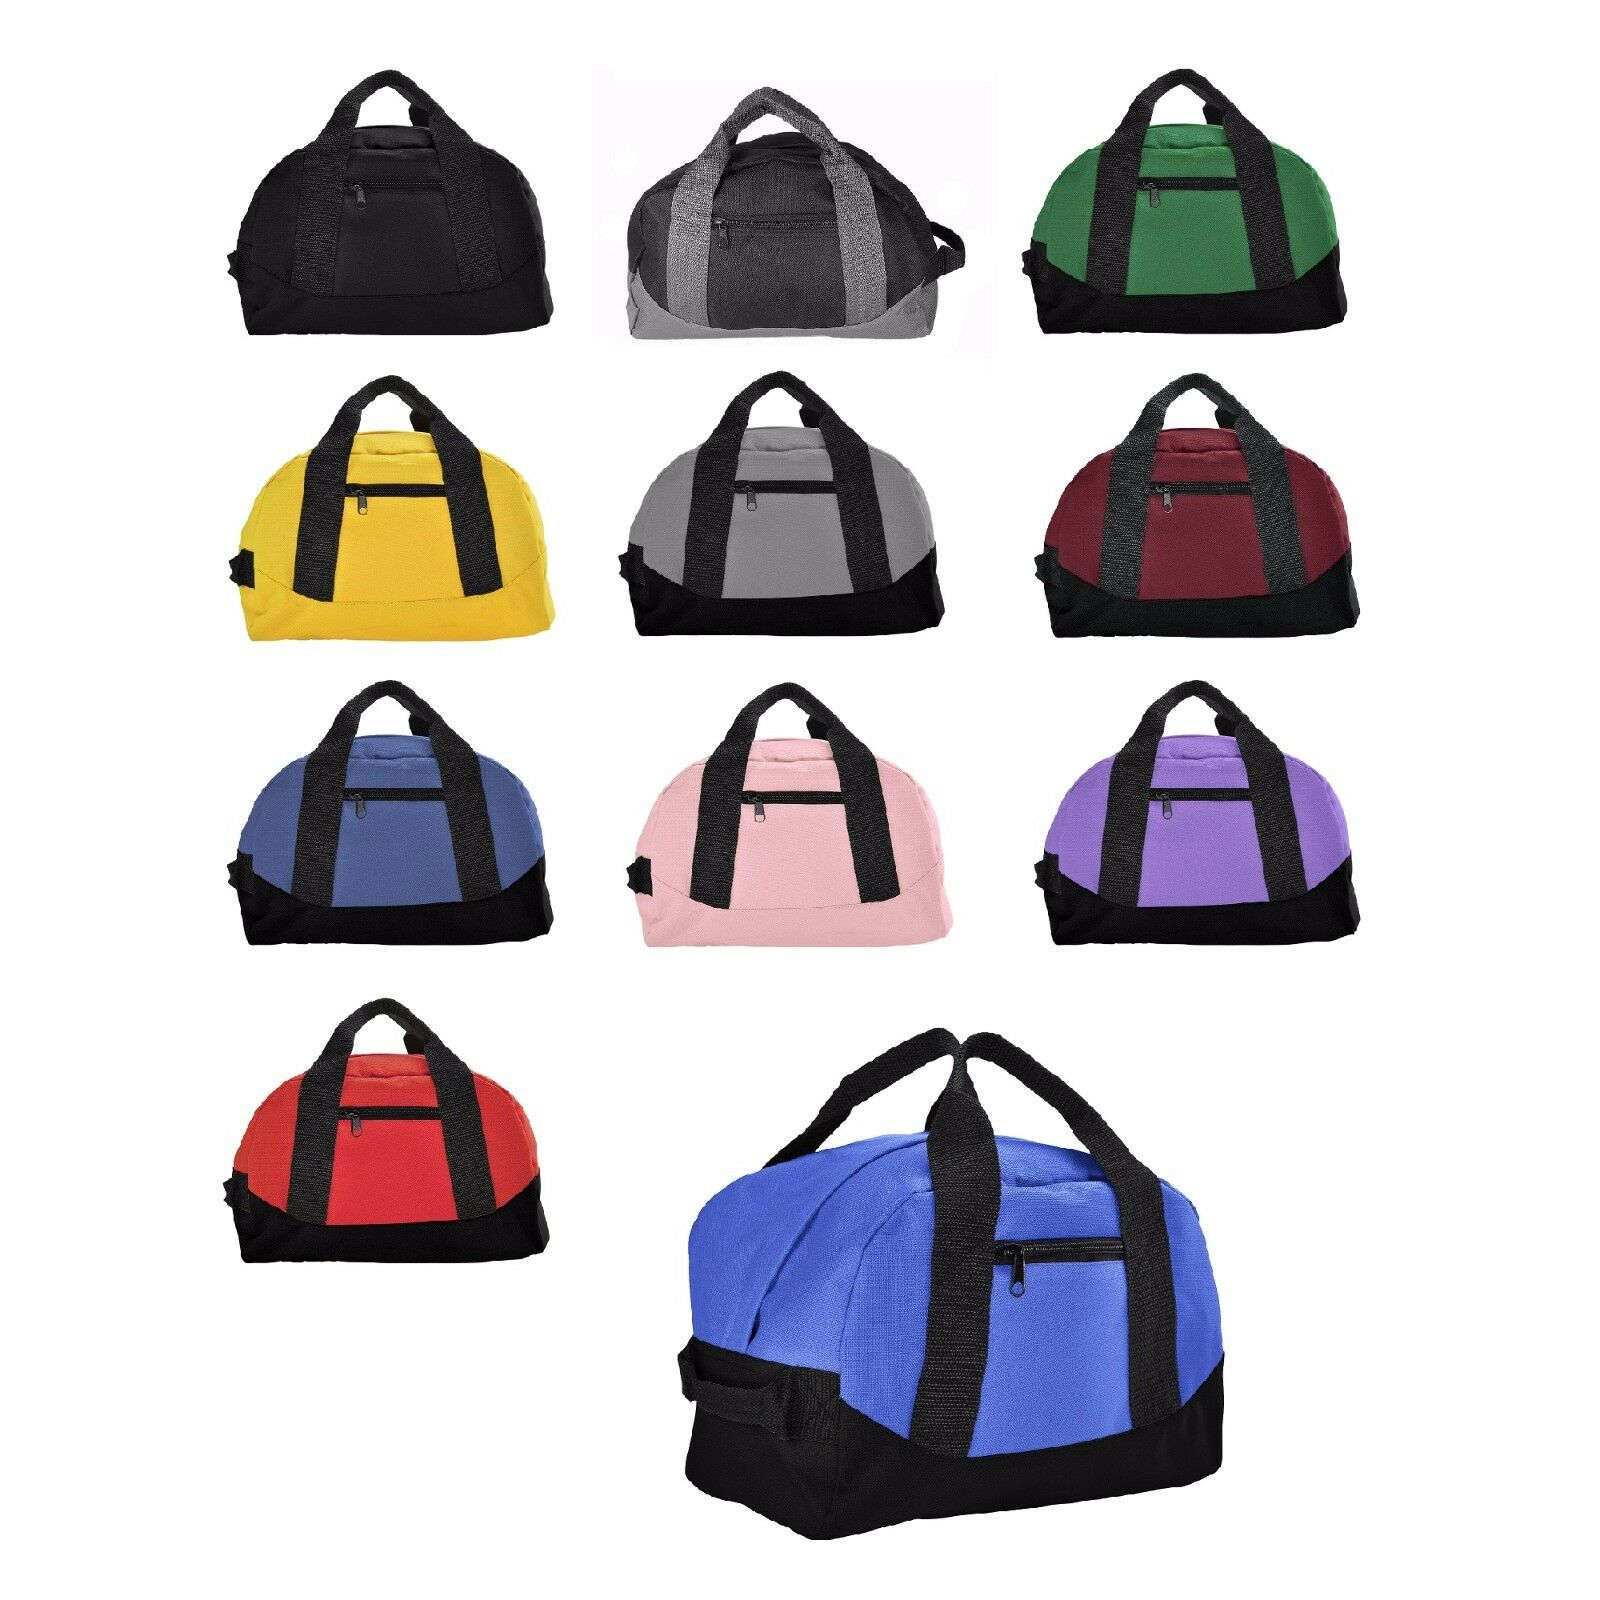 "DALIX 12"" Small Duffle Bag Gym Mini Travel Overnight Bag Bla"